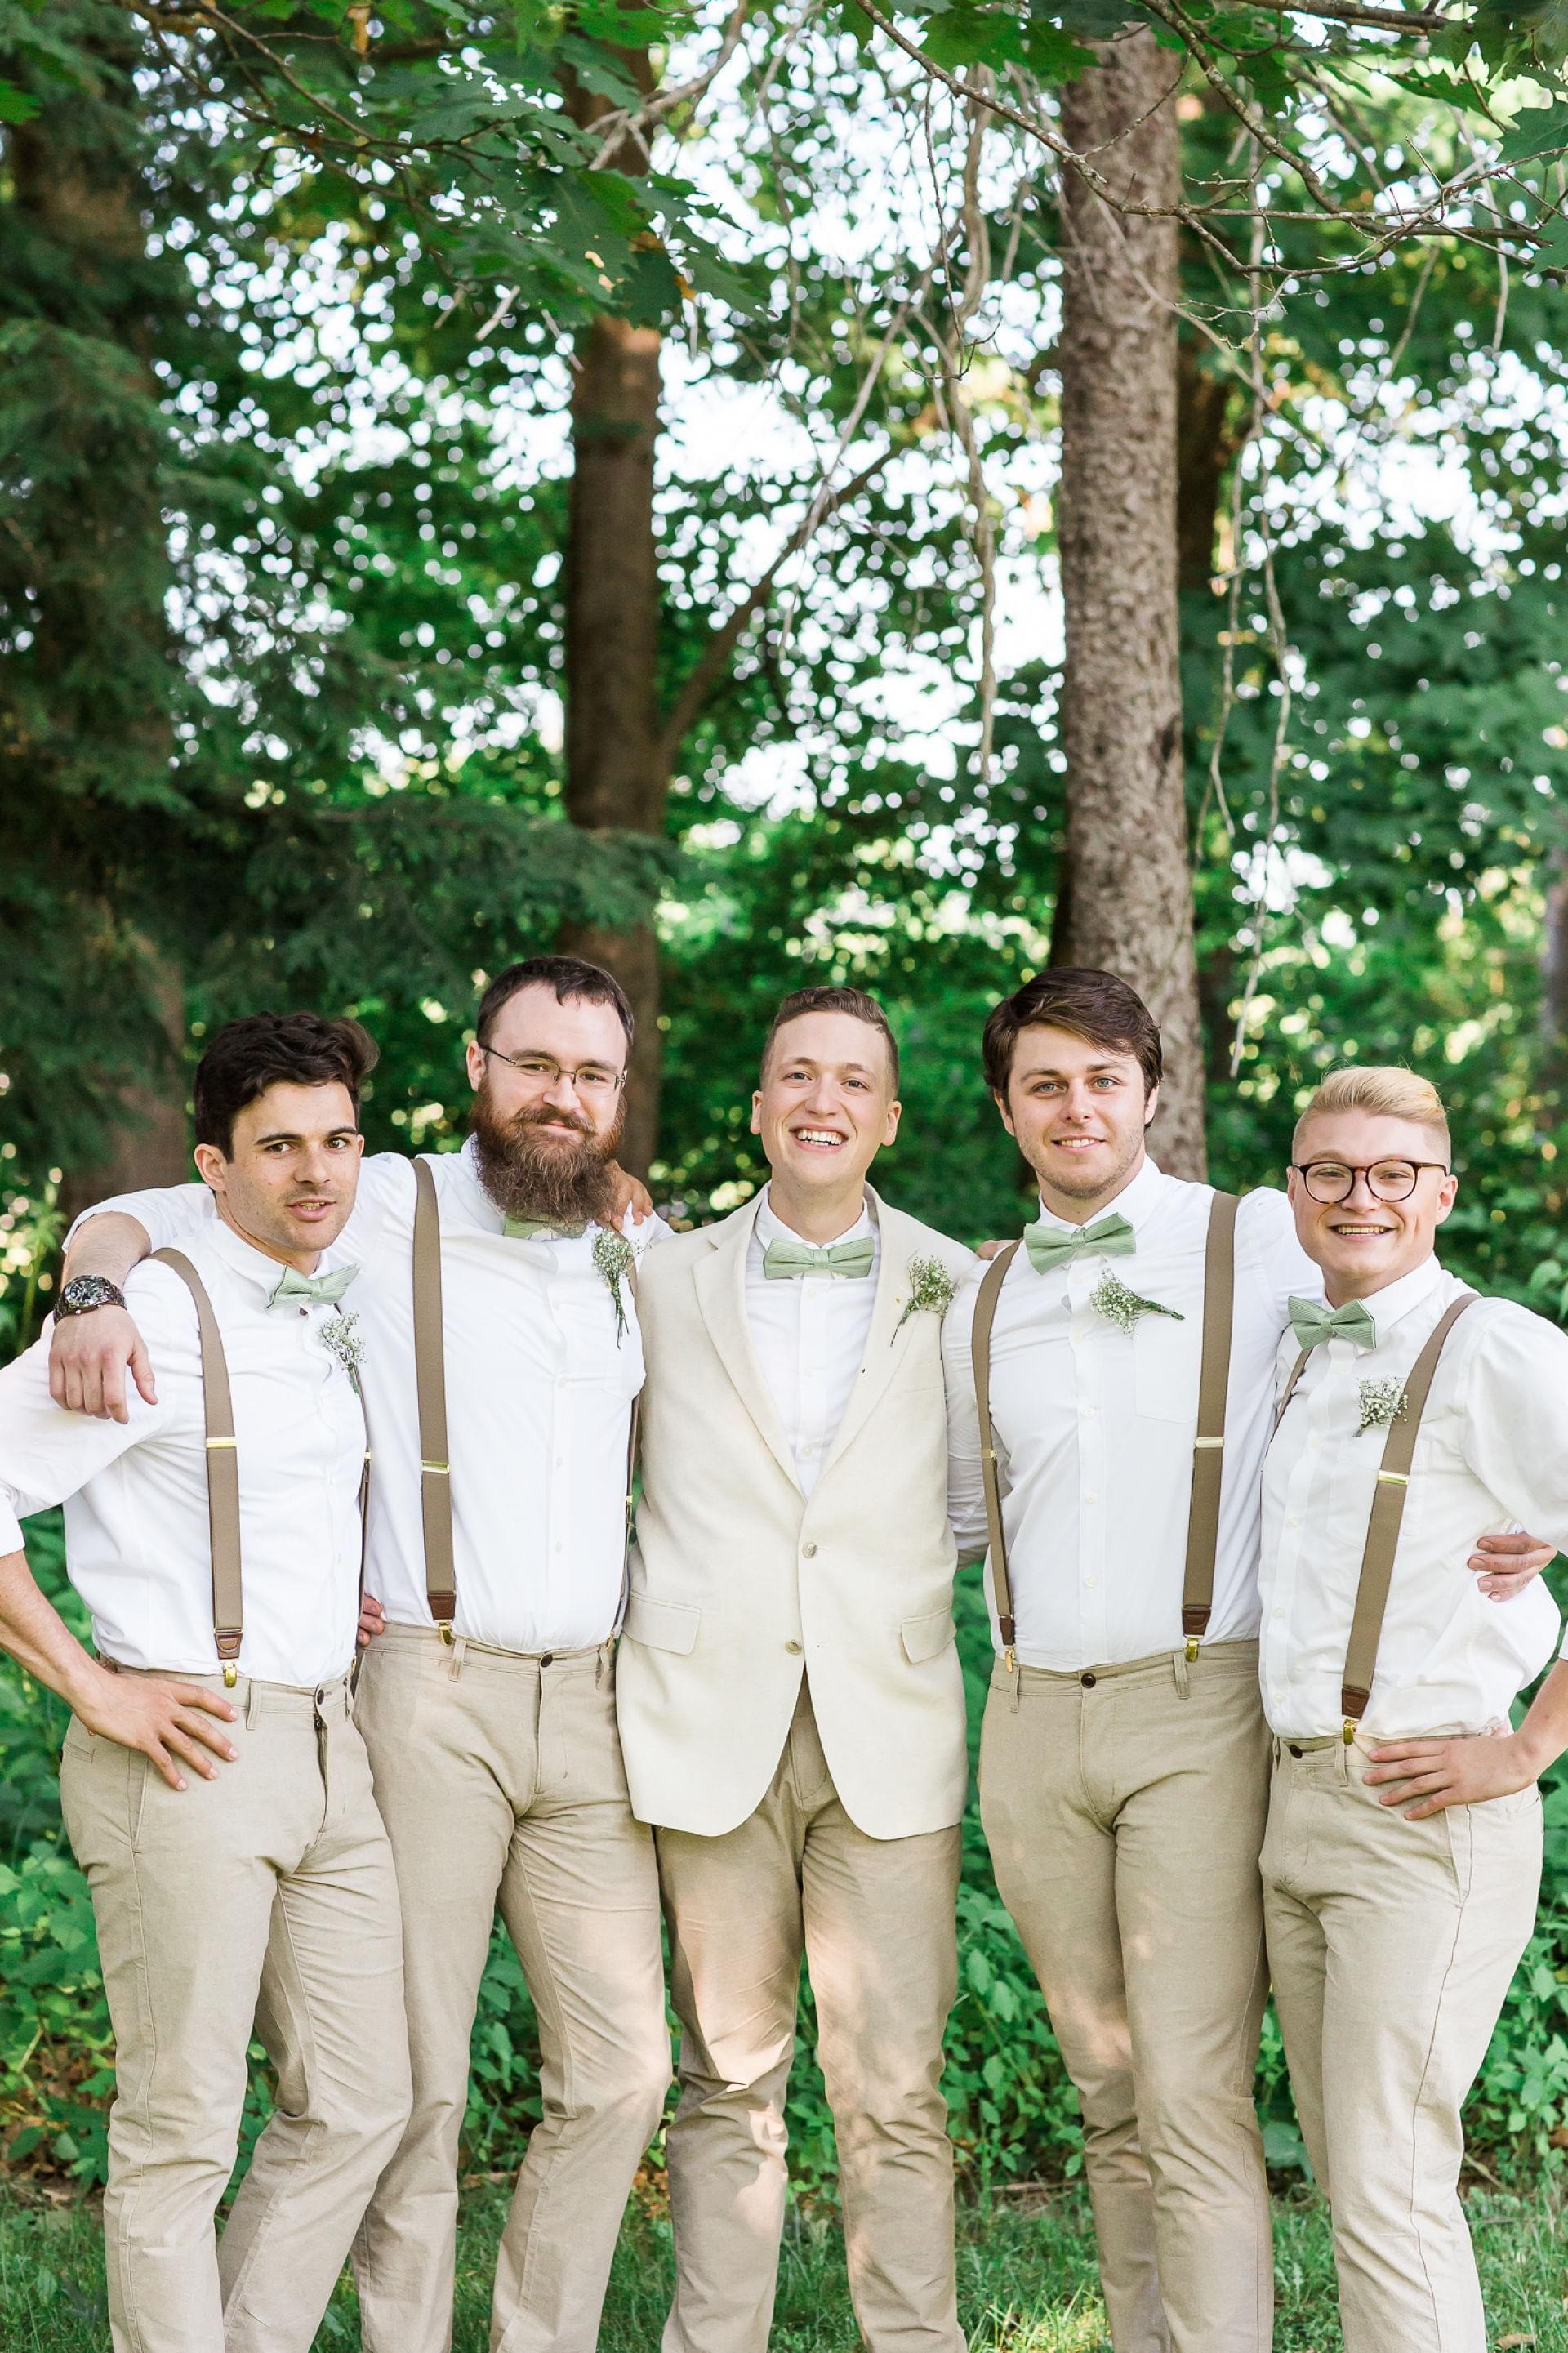 The Smarter Way to Wed Groomsmen fashion, Groomsmen